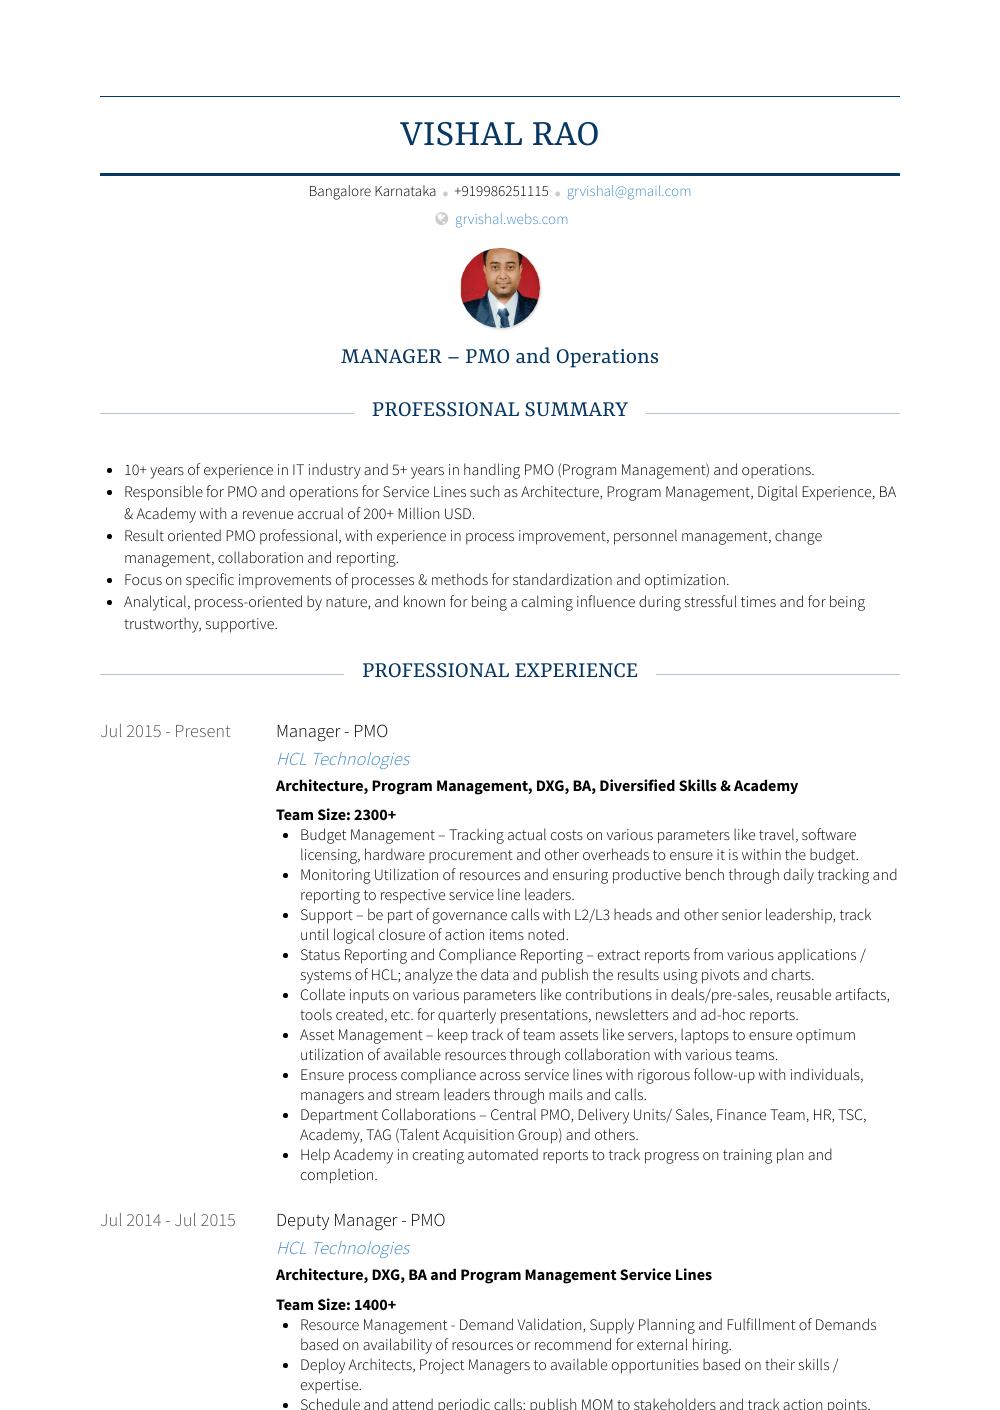 Deputy Manager - Resume Samples & Templates   VisualCV